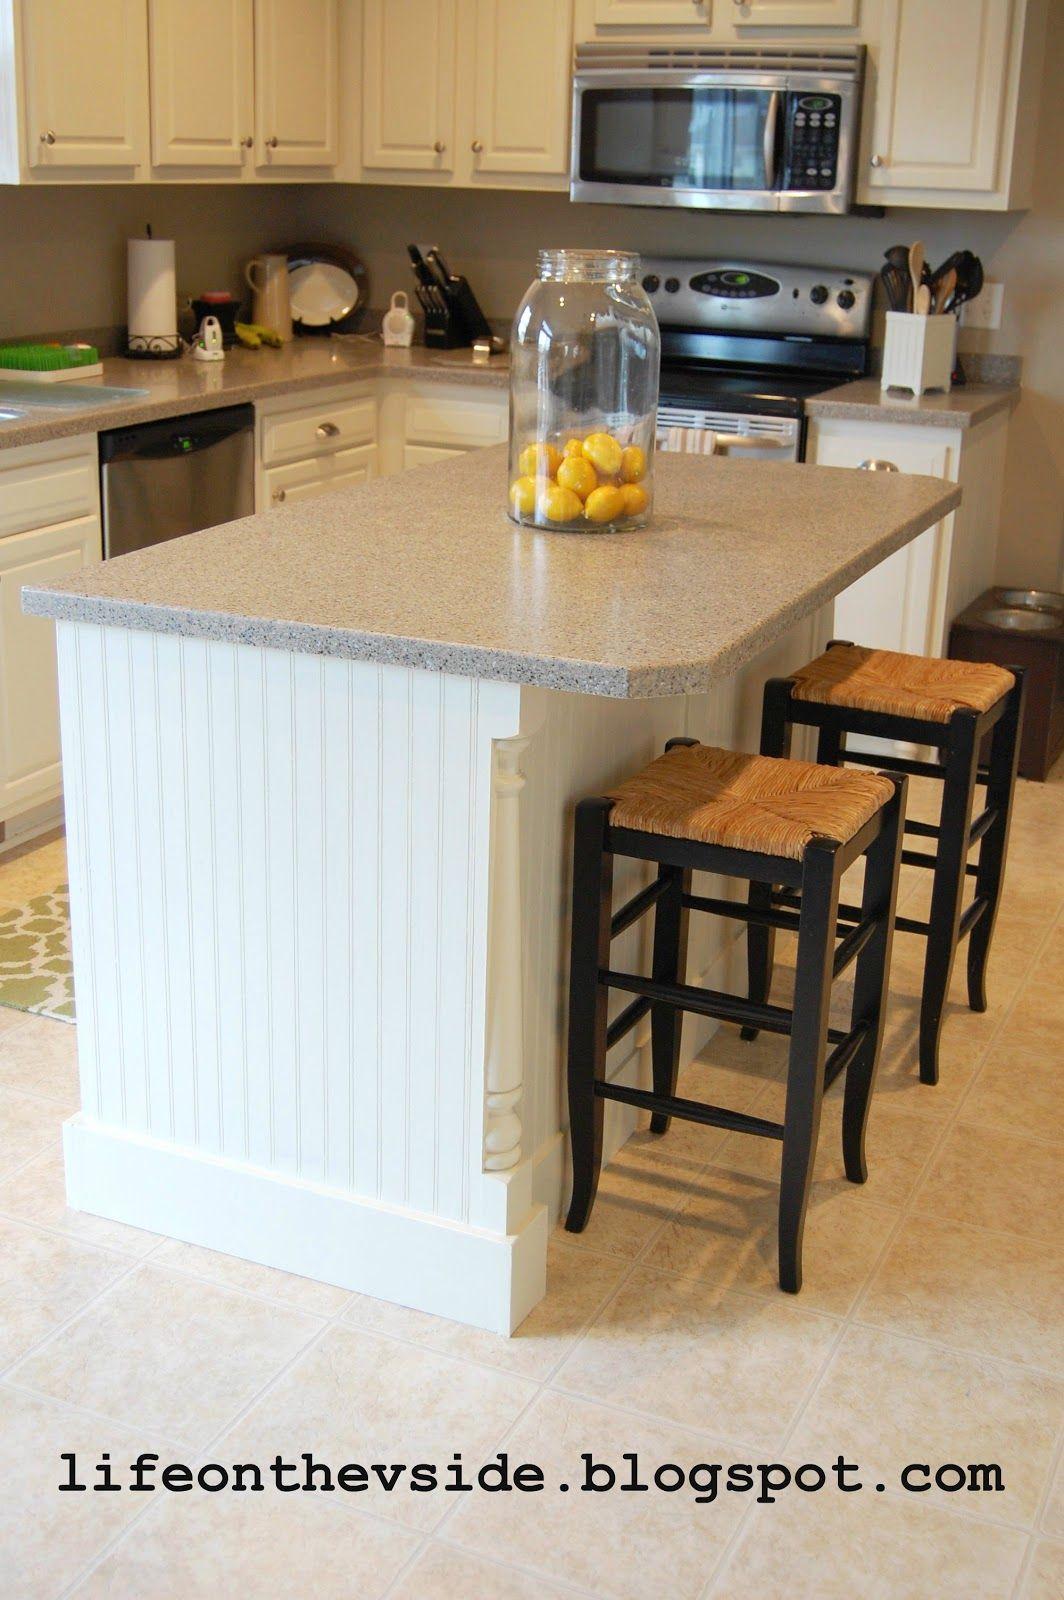 DIY Kitchen Island Update Tutorial @ lifeonthevside.blogspot.com ...